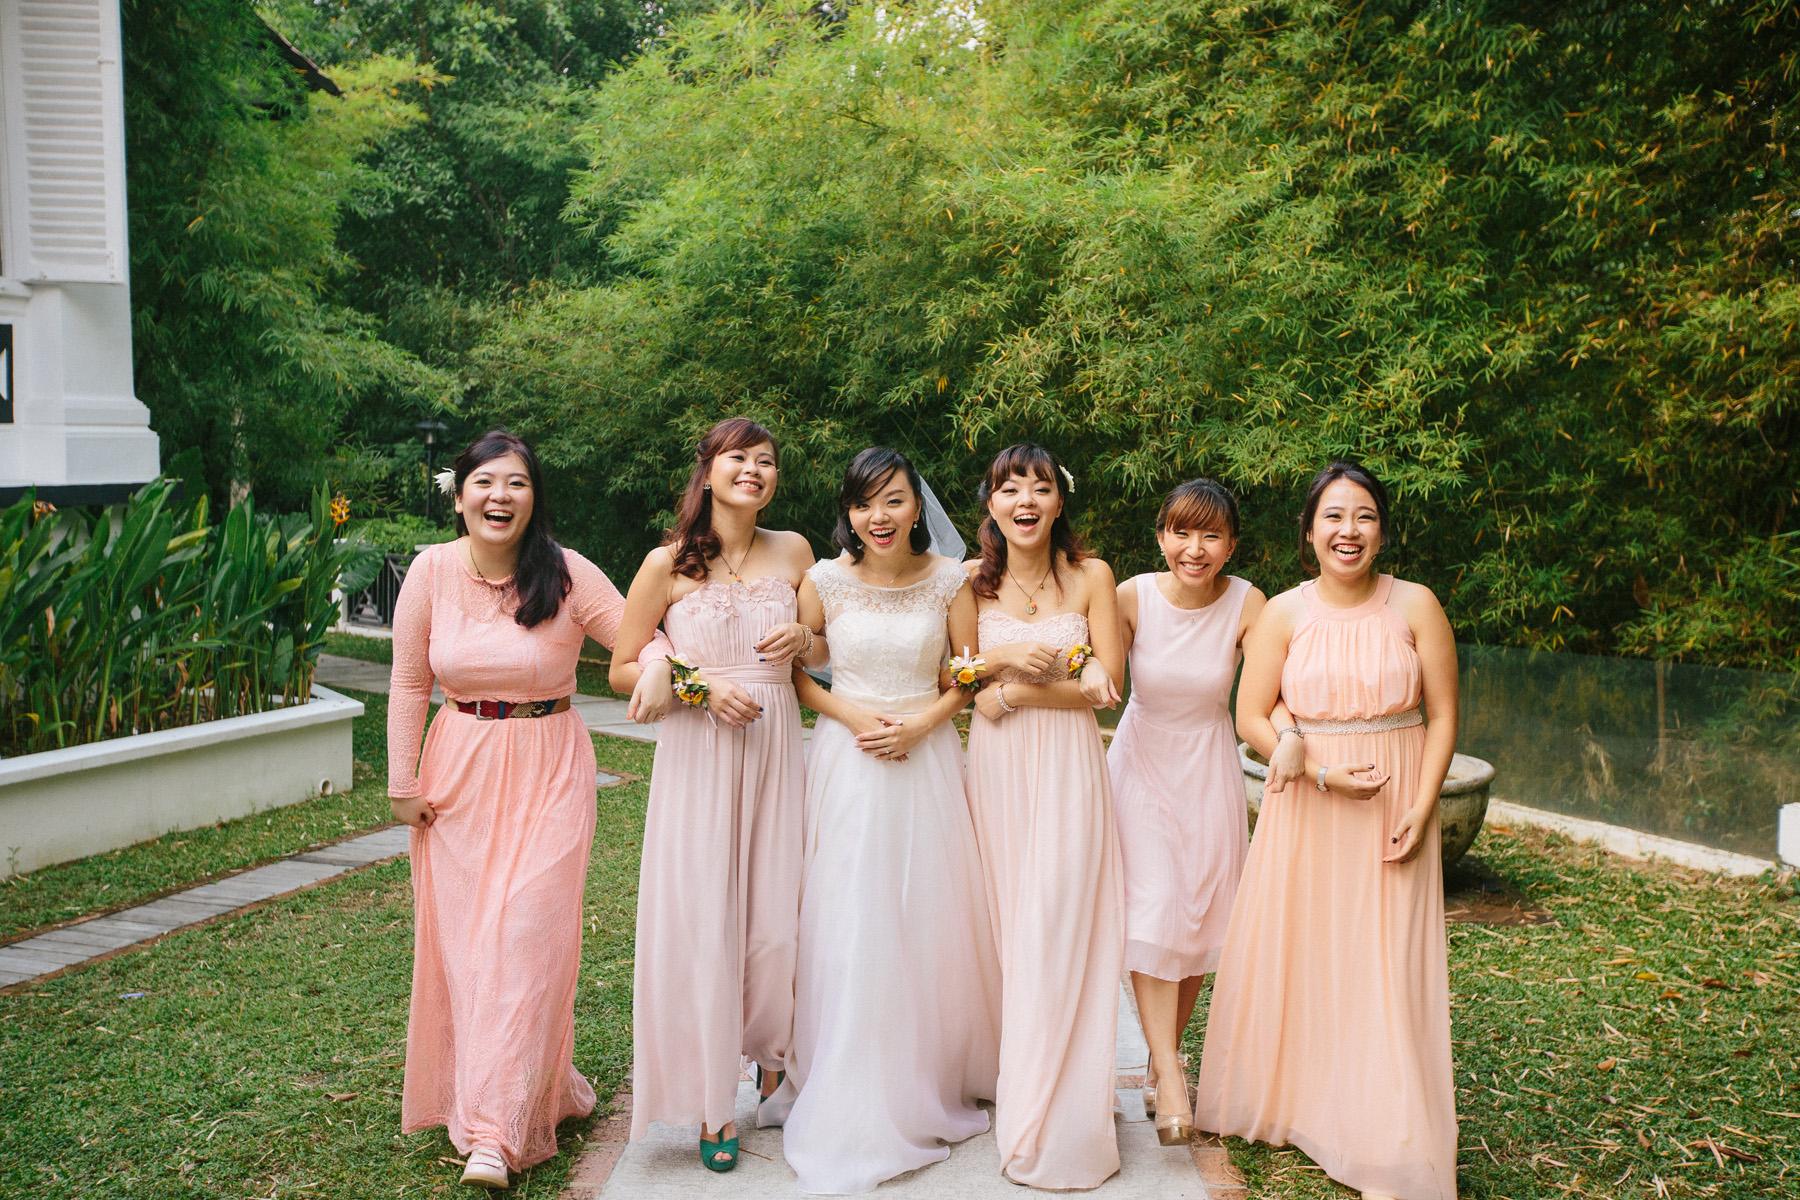 singapore-wedding-travel-photographer-faith-alvin-wedding-wmt-30.jpg